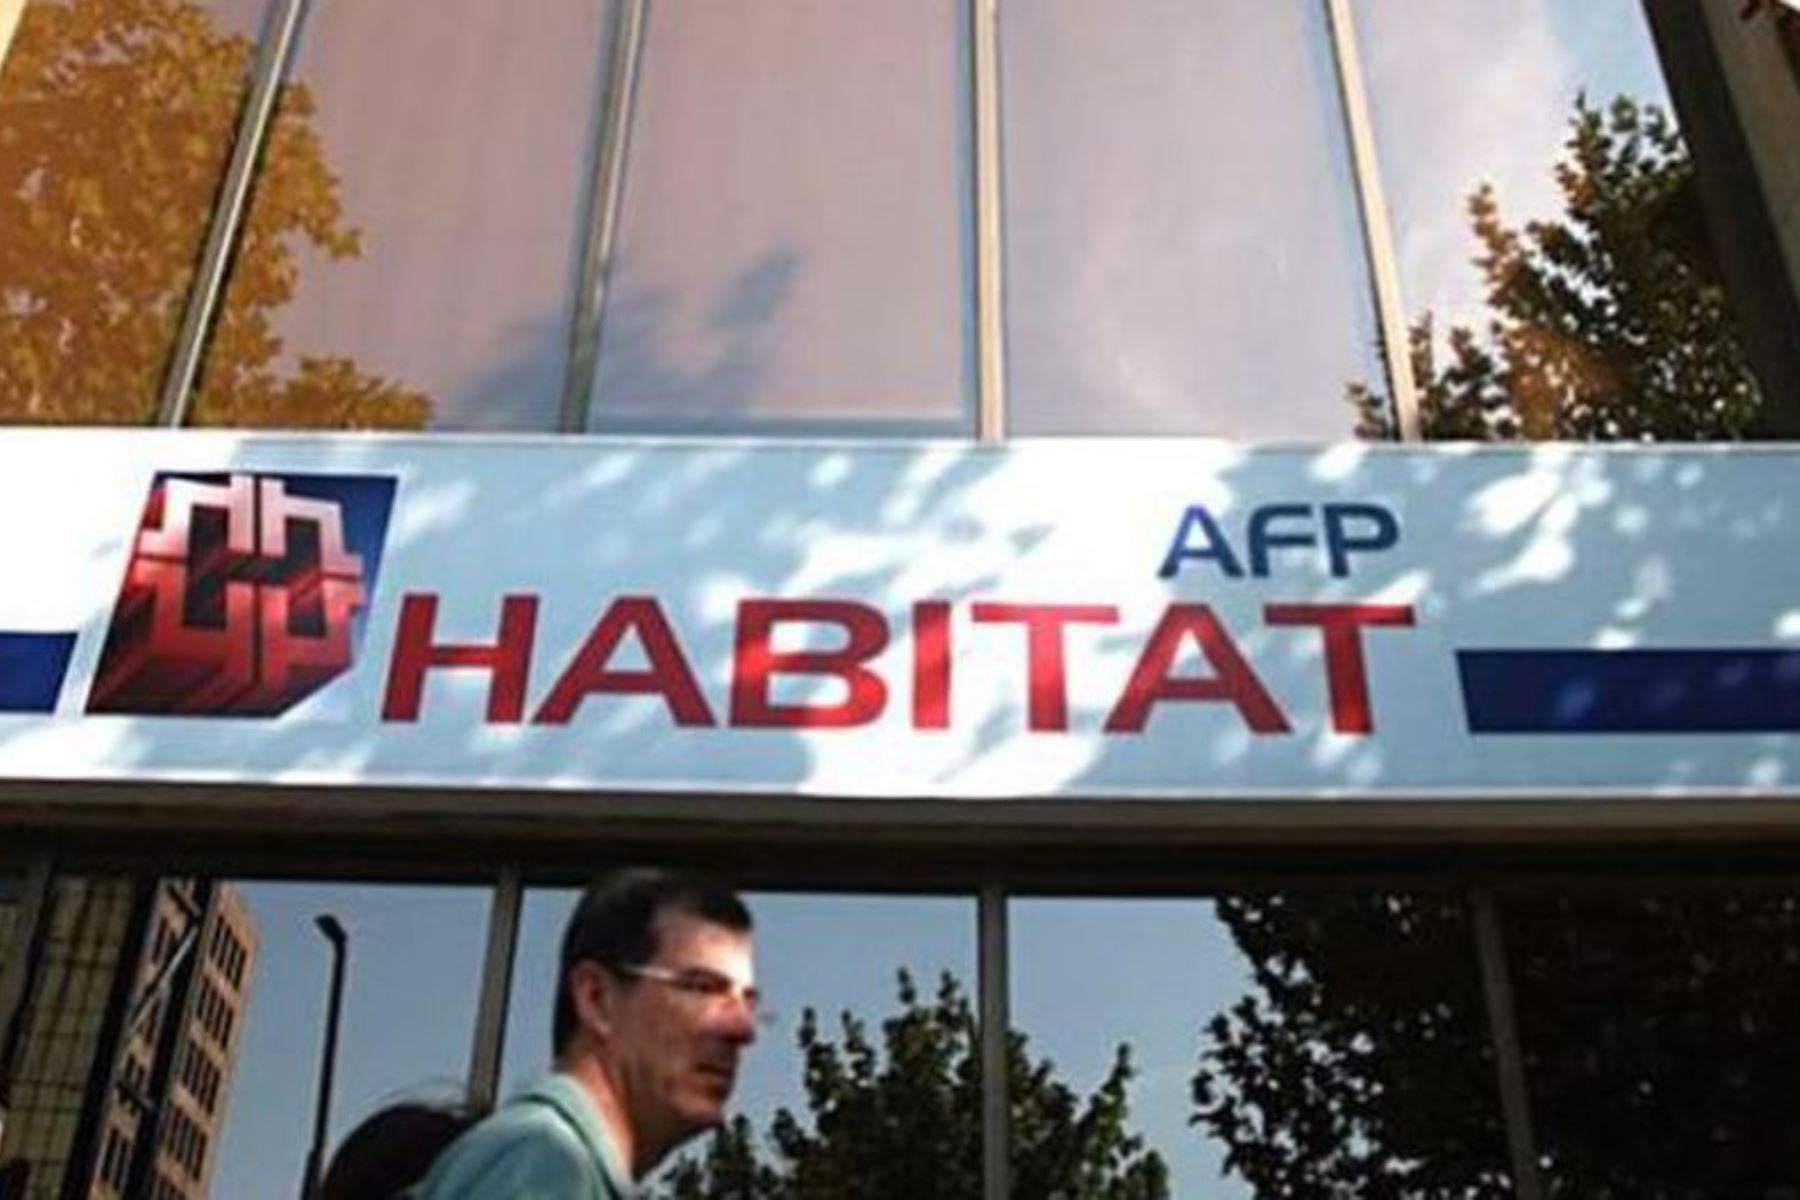 Foto: AFP Habitat.